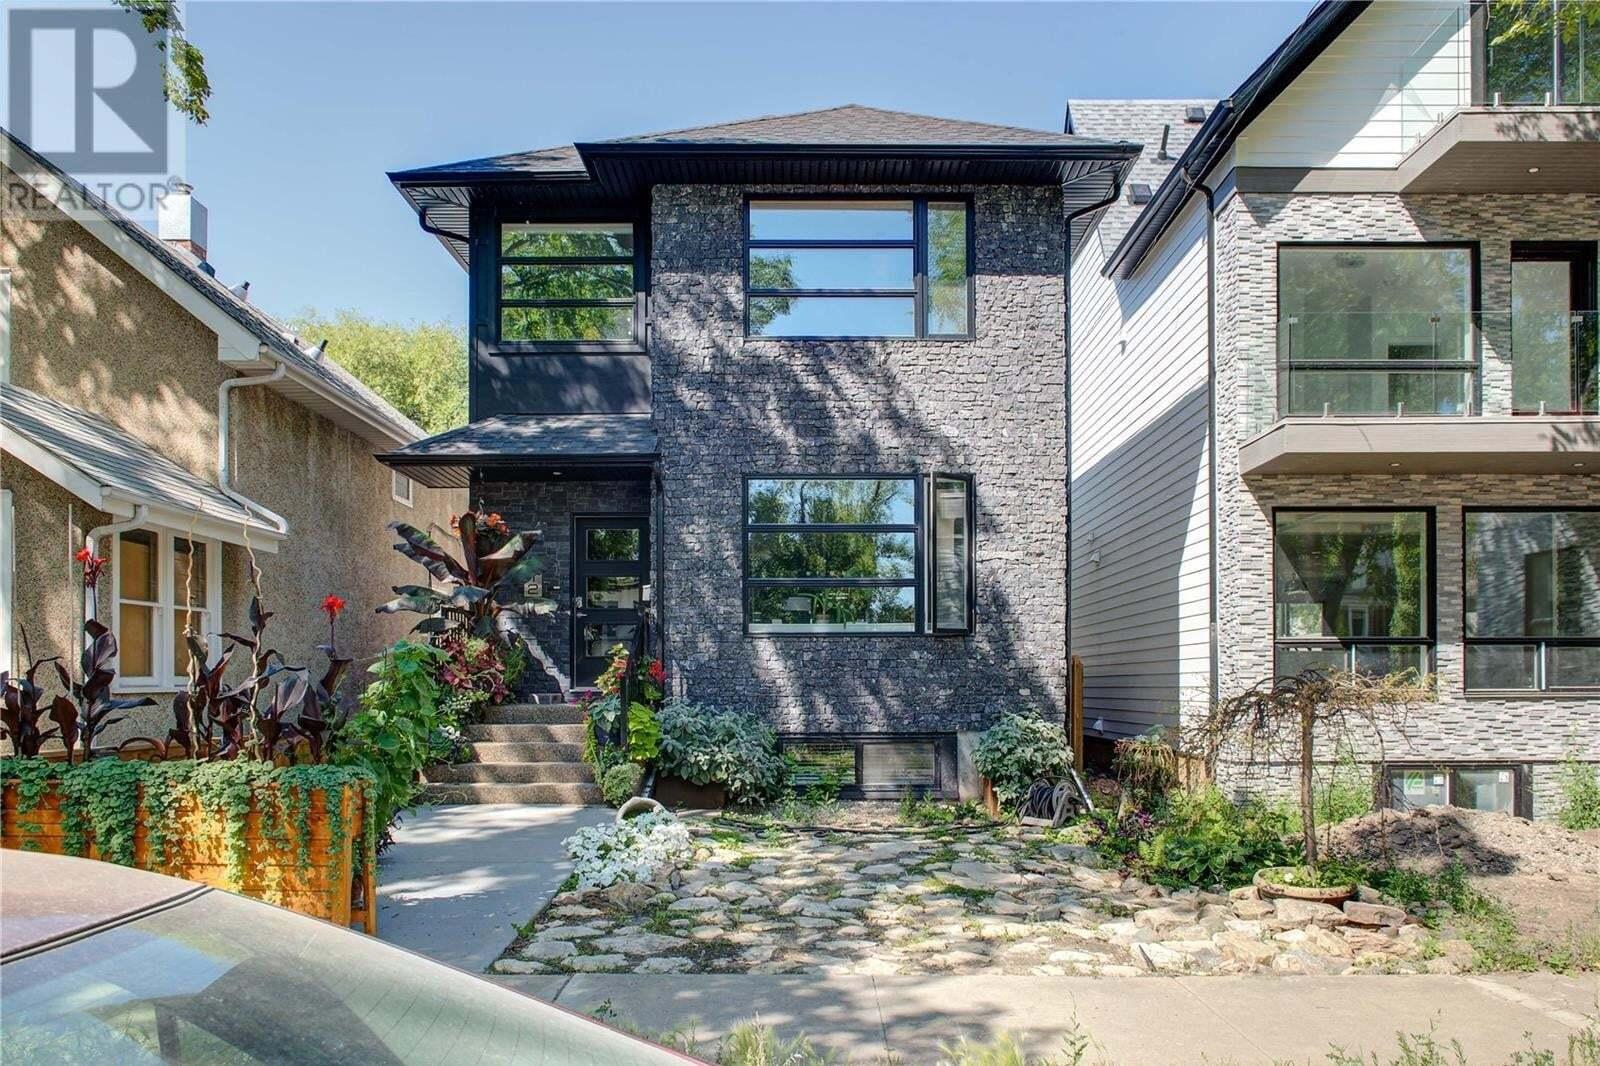 House for sale at 512 Landsdowne Ave Saskatoon Saskatchewan - MLS: SK819309